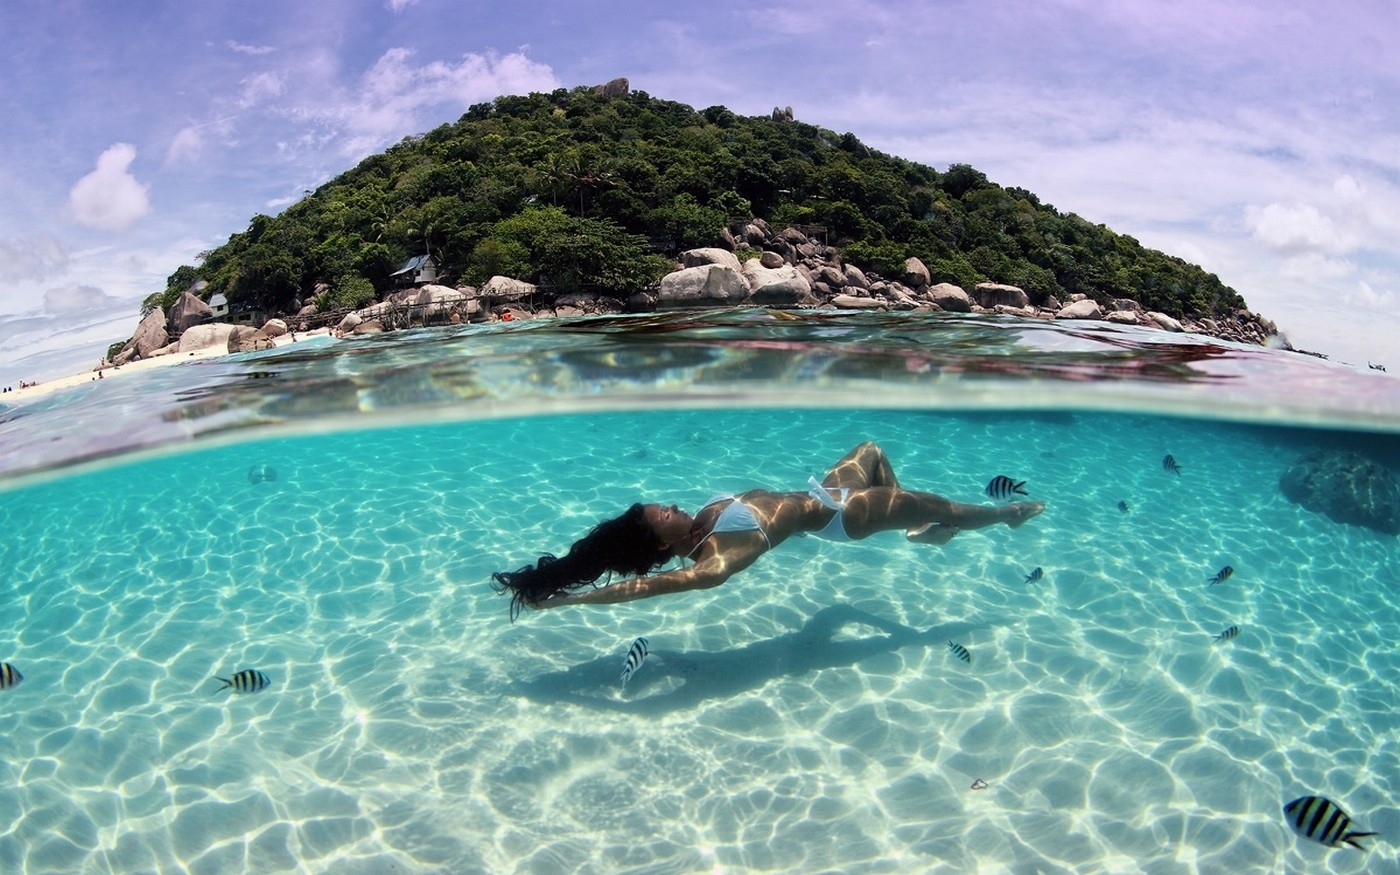 General 1400x875 landscape nature tropical beach island sea underwater summer women bikini wet body wet hair women outdoors